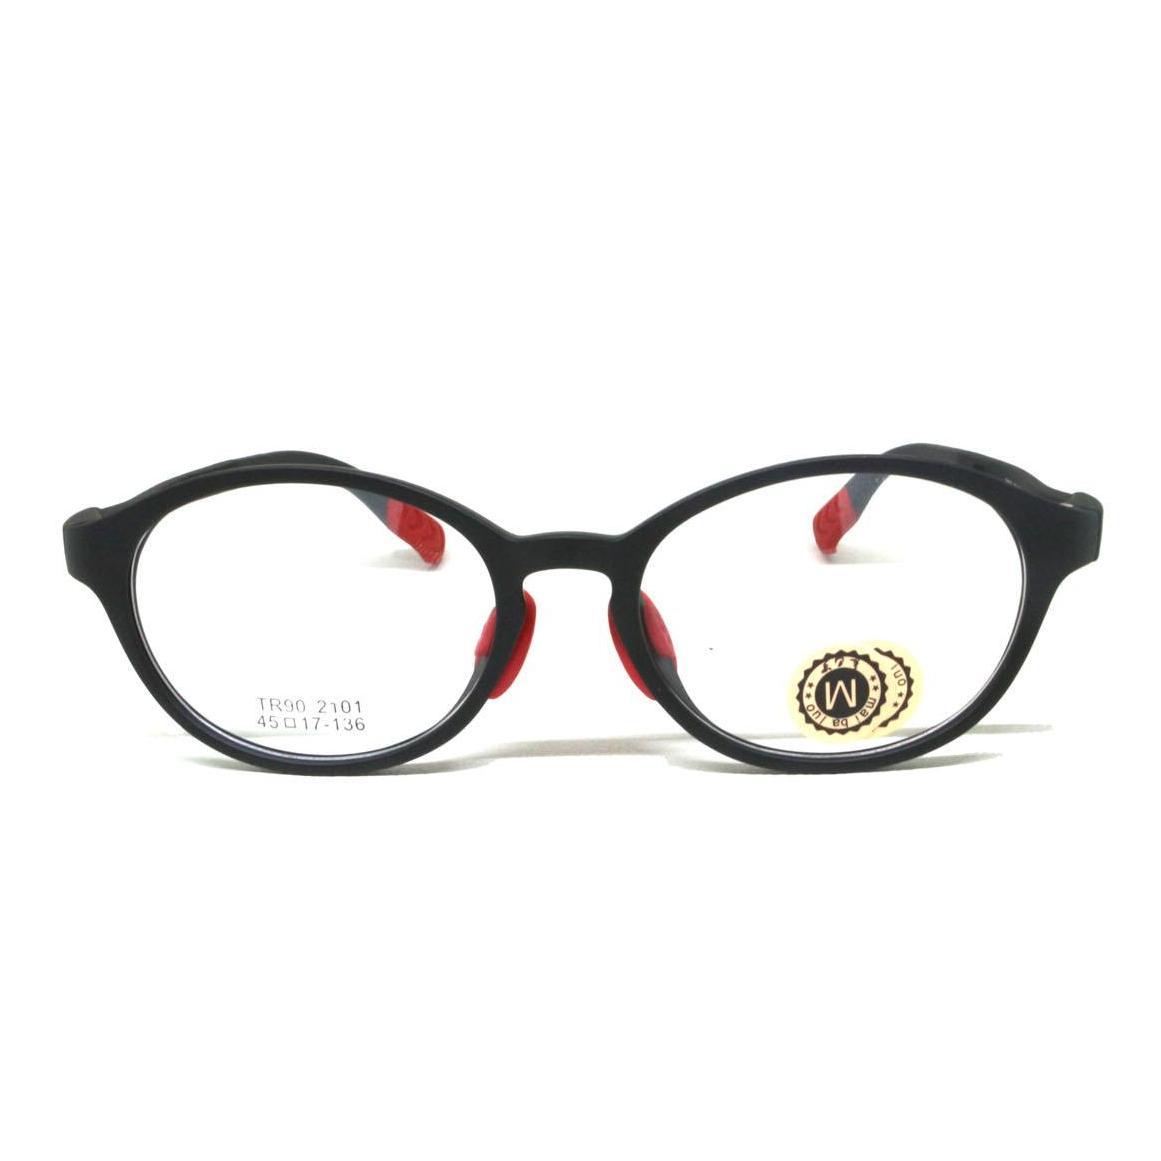 Frame Kaca Mata Anak Hitam 2101 By Cek Toko Sebelah-.